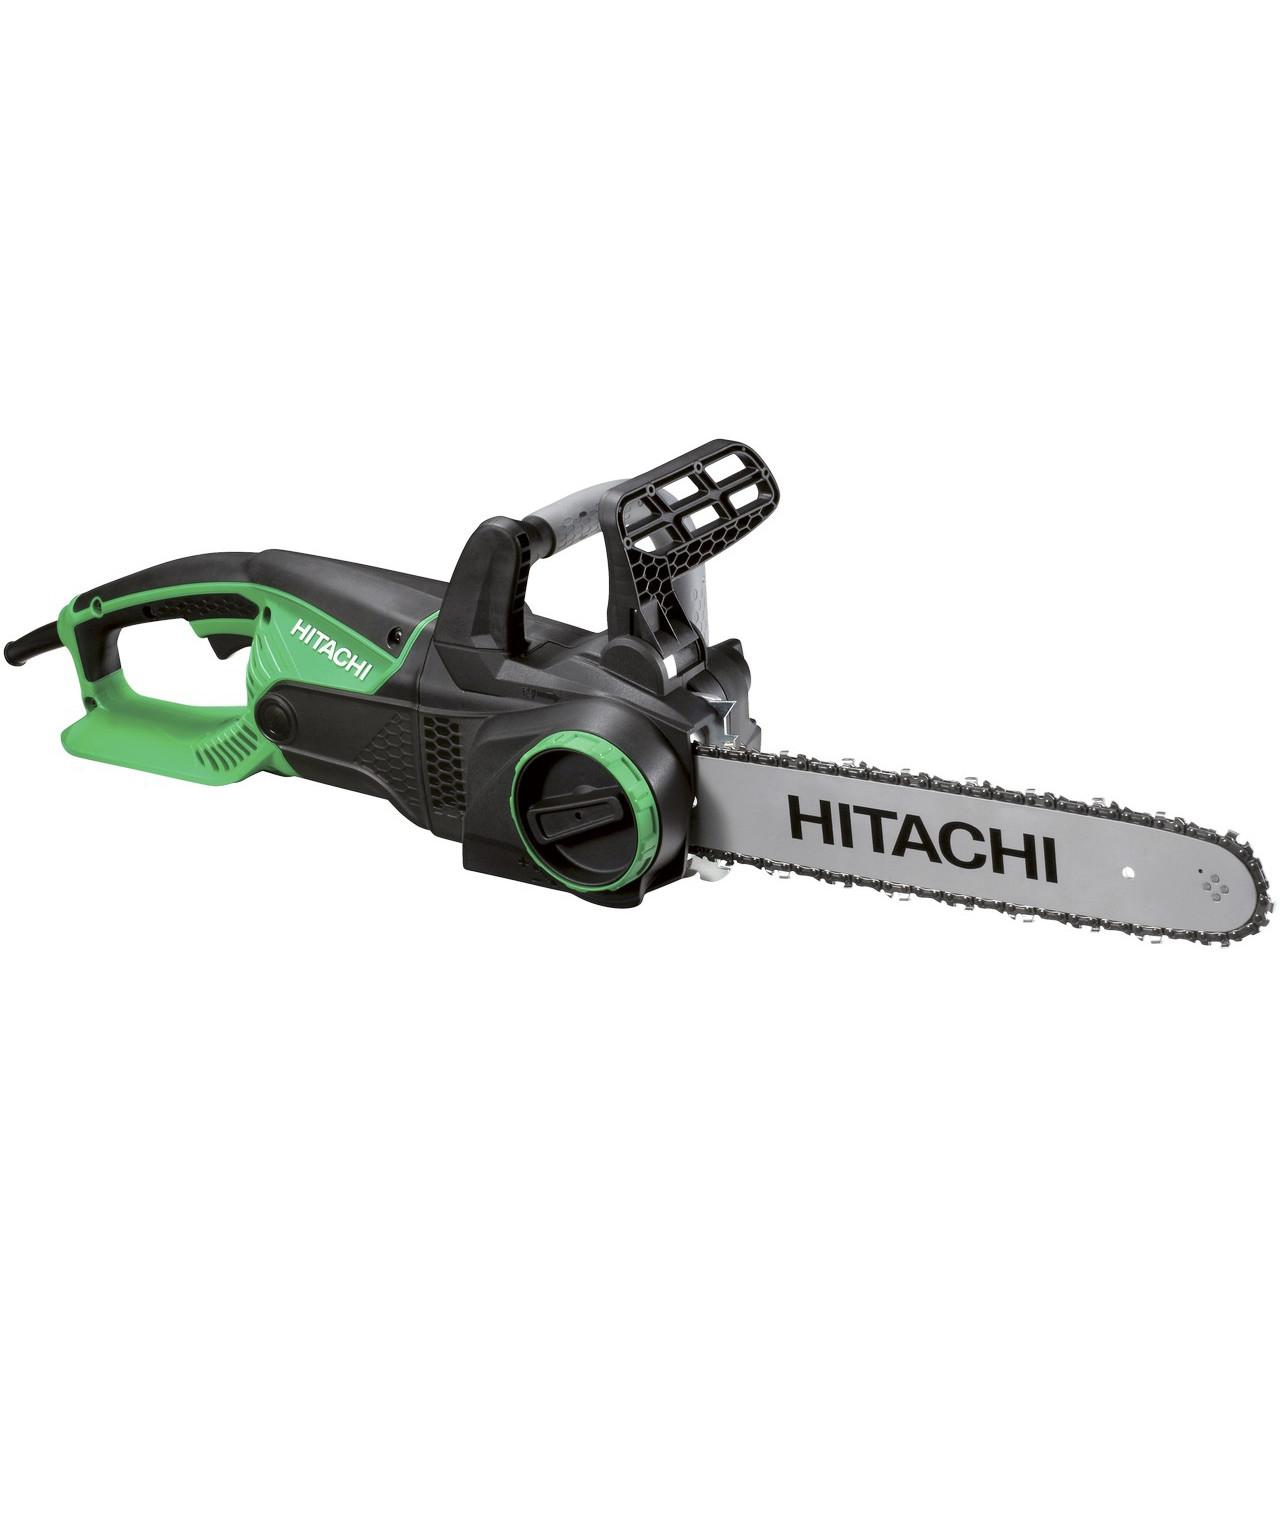 Hitachi CS 35Y kædesav 2000W 230V